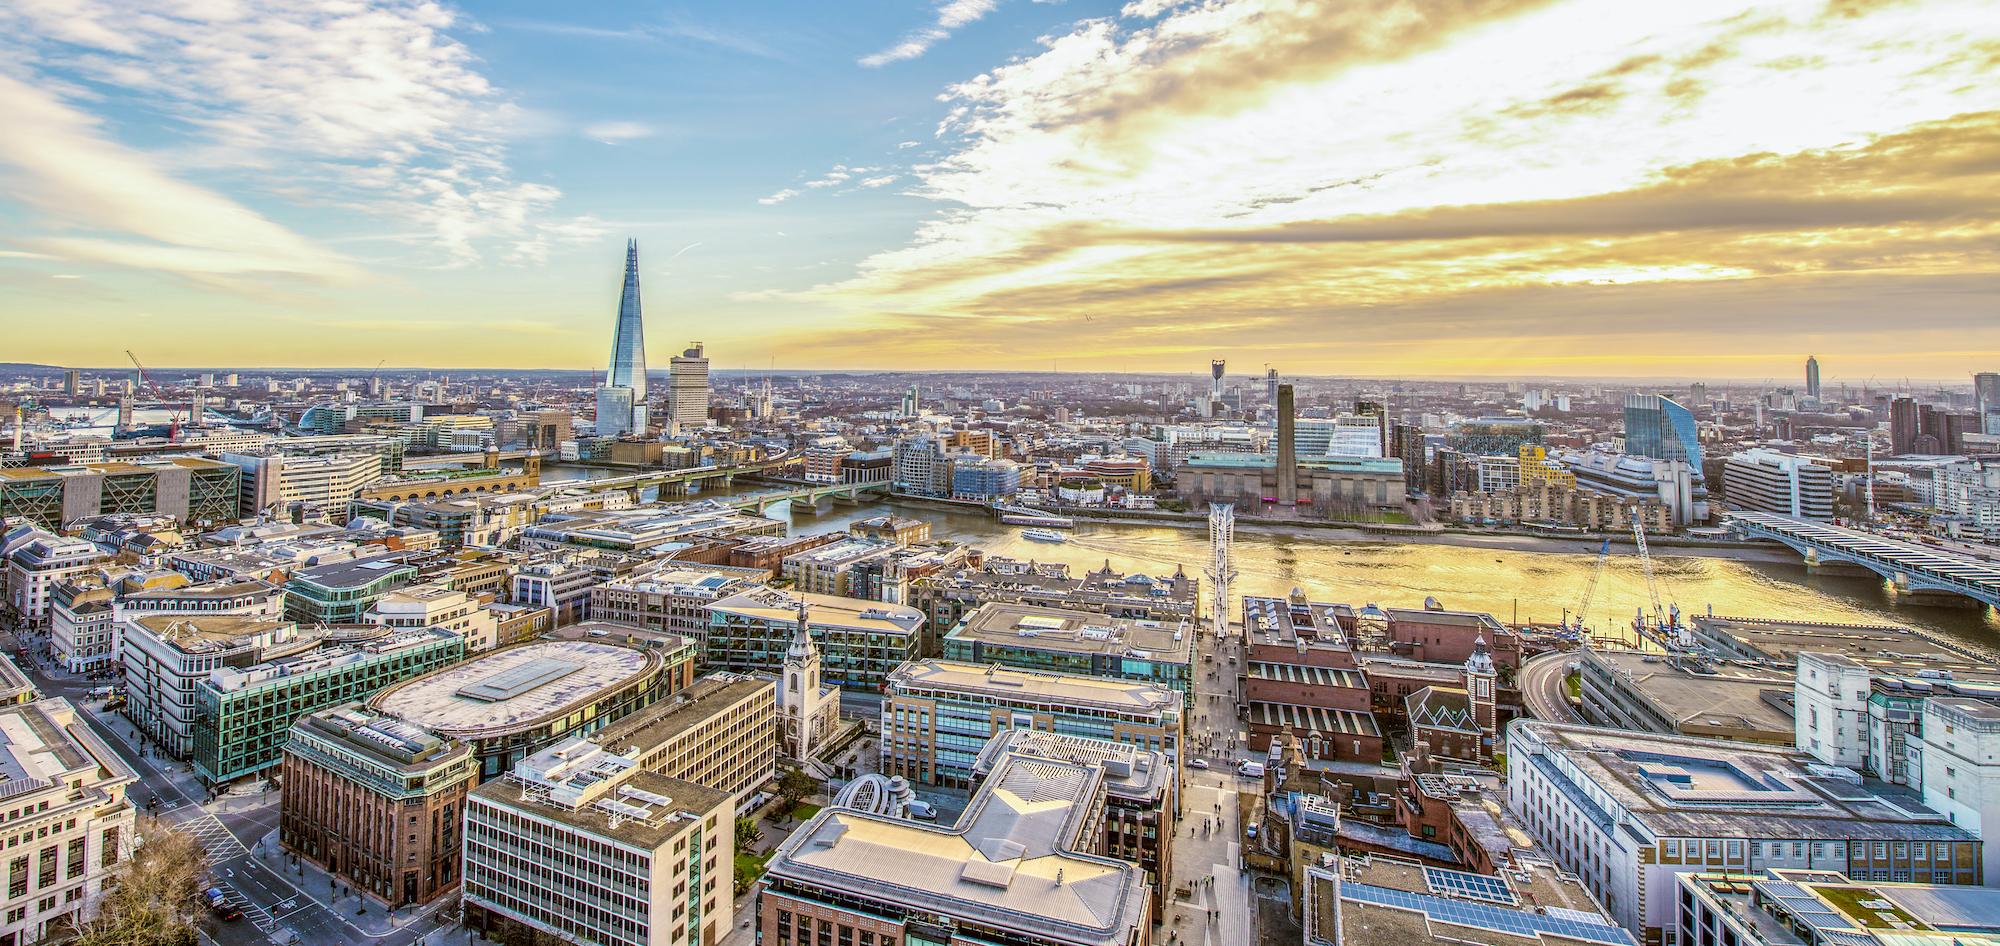 Oxygen buys £400m City HQ